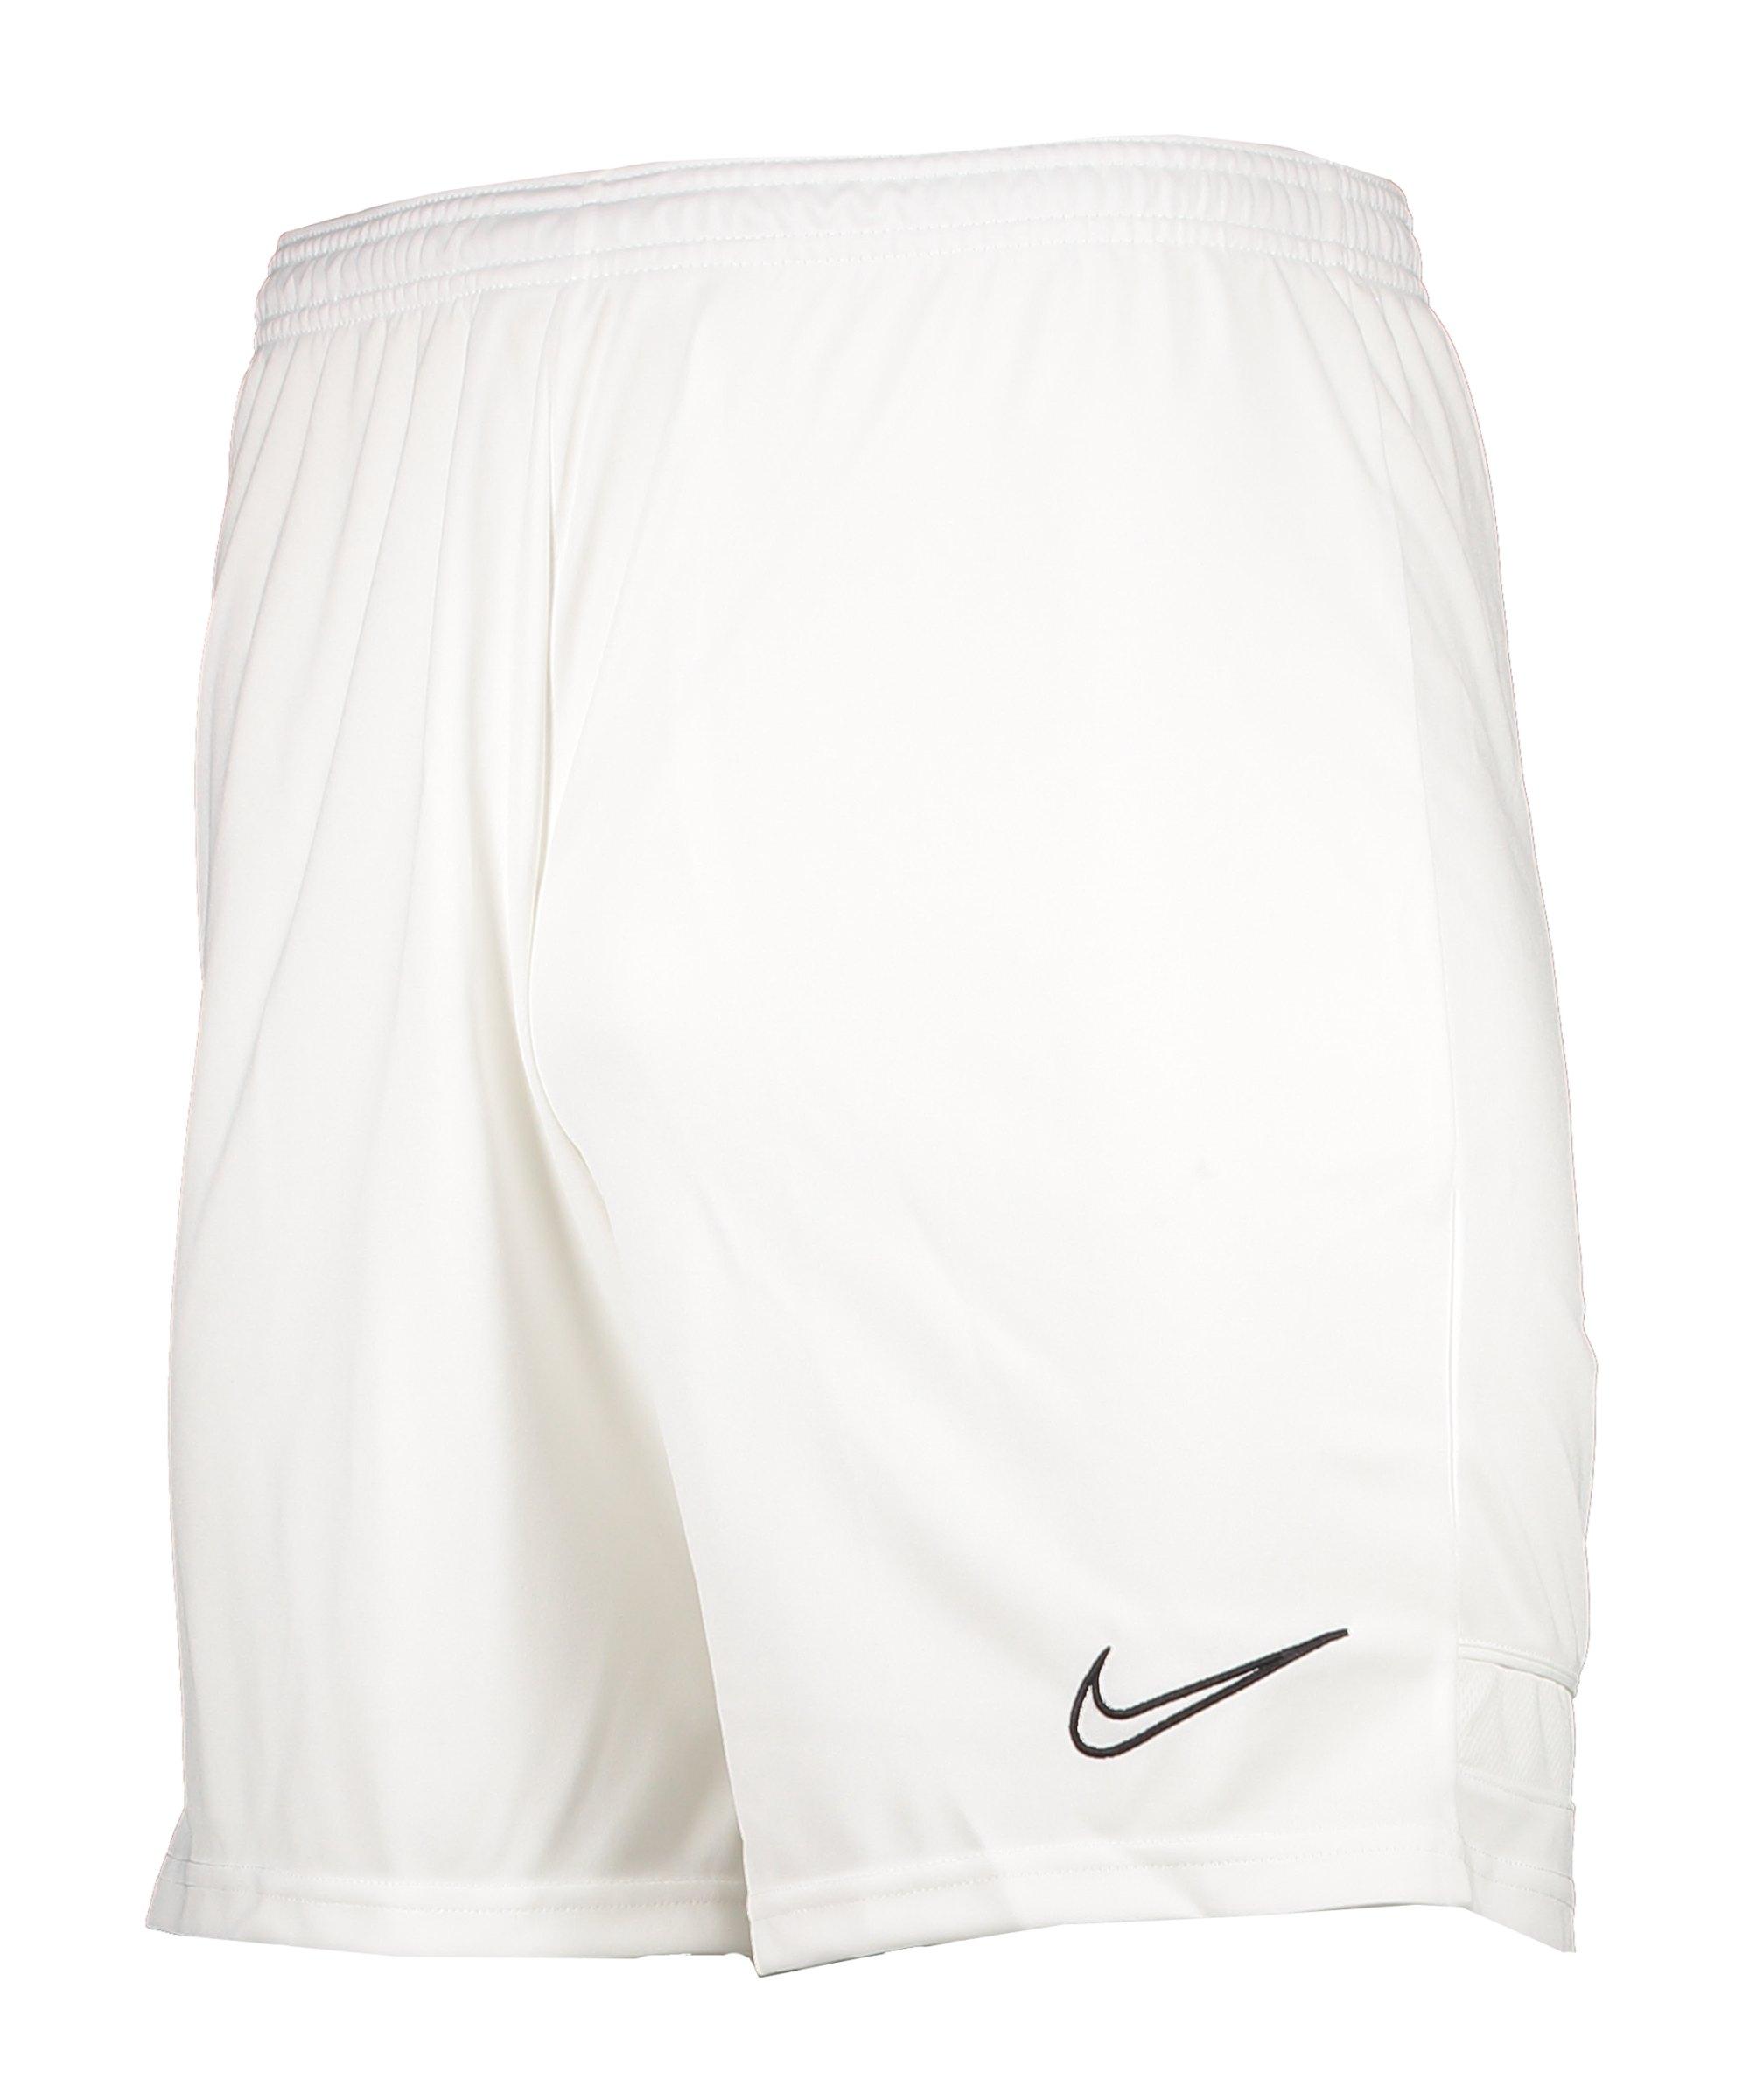 Nike Academy 21 Short Weiss Schwarz F100 - weiss